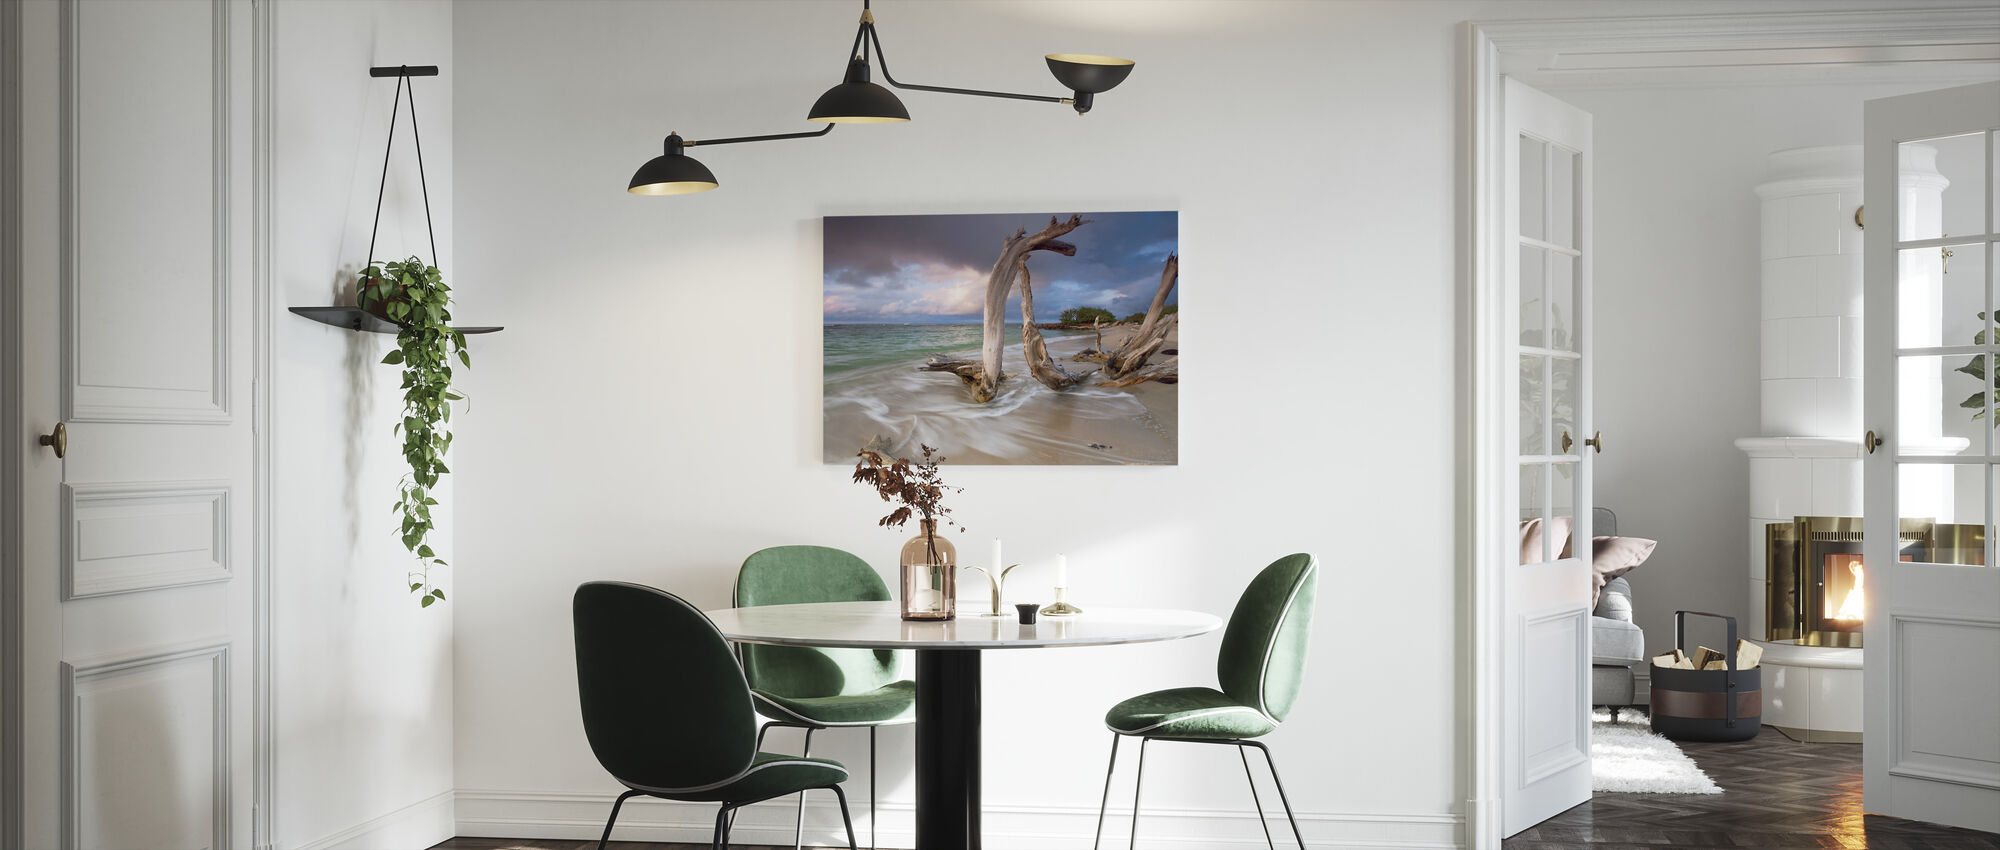 Driftwood Sunset - Canvas print - Kitchen